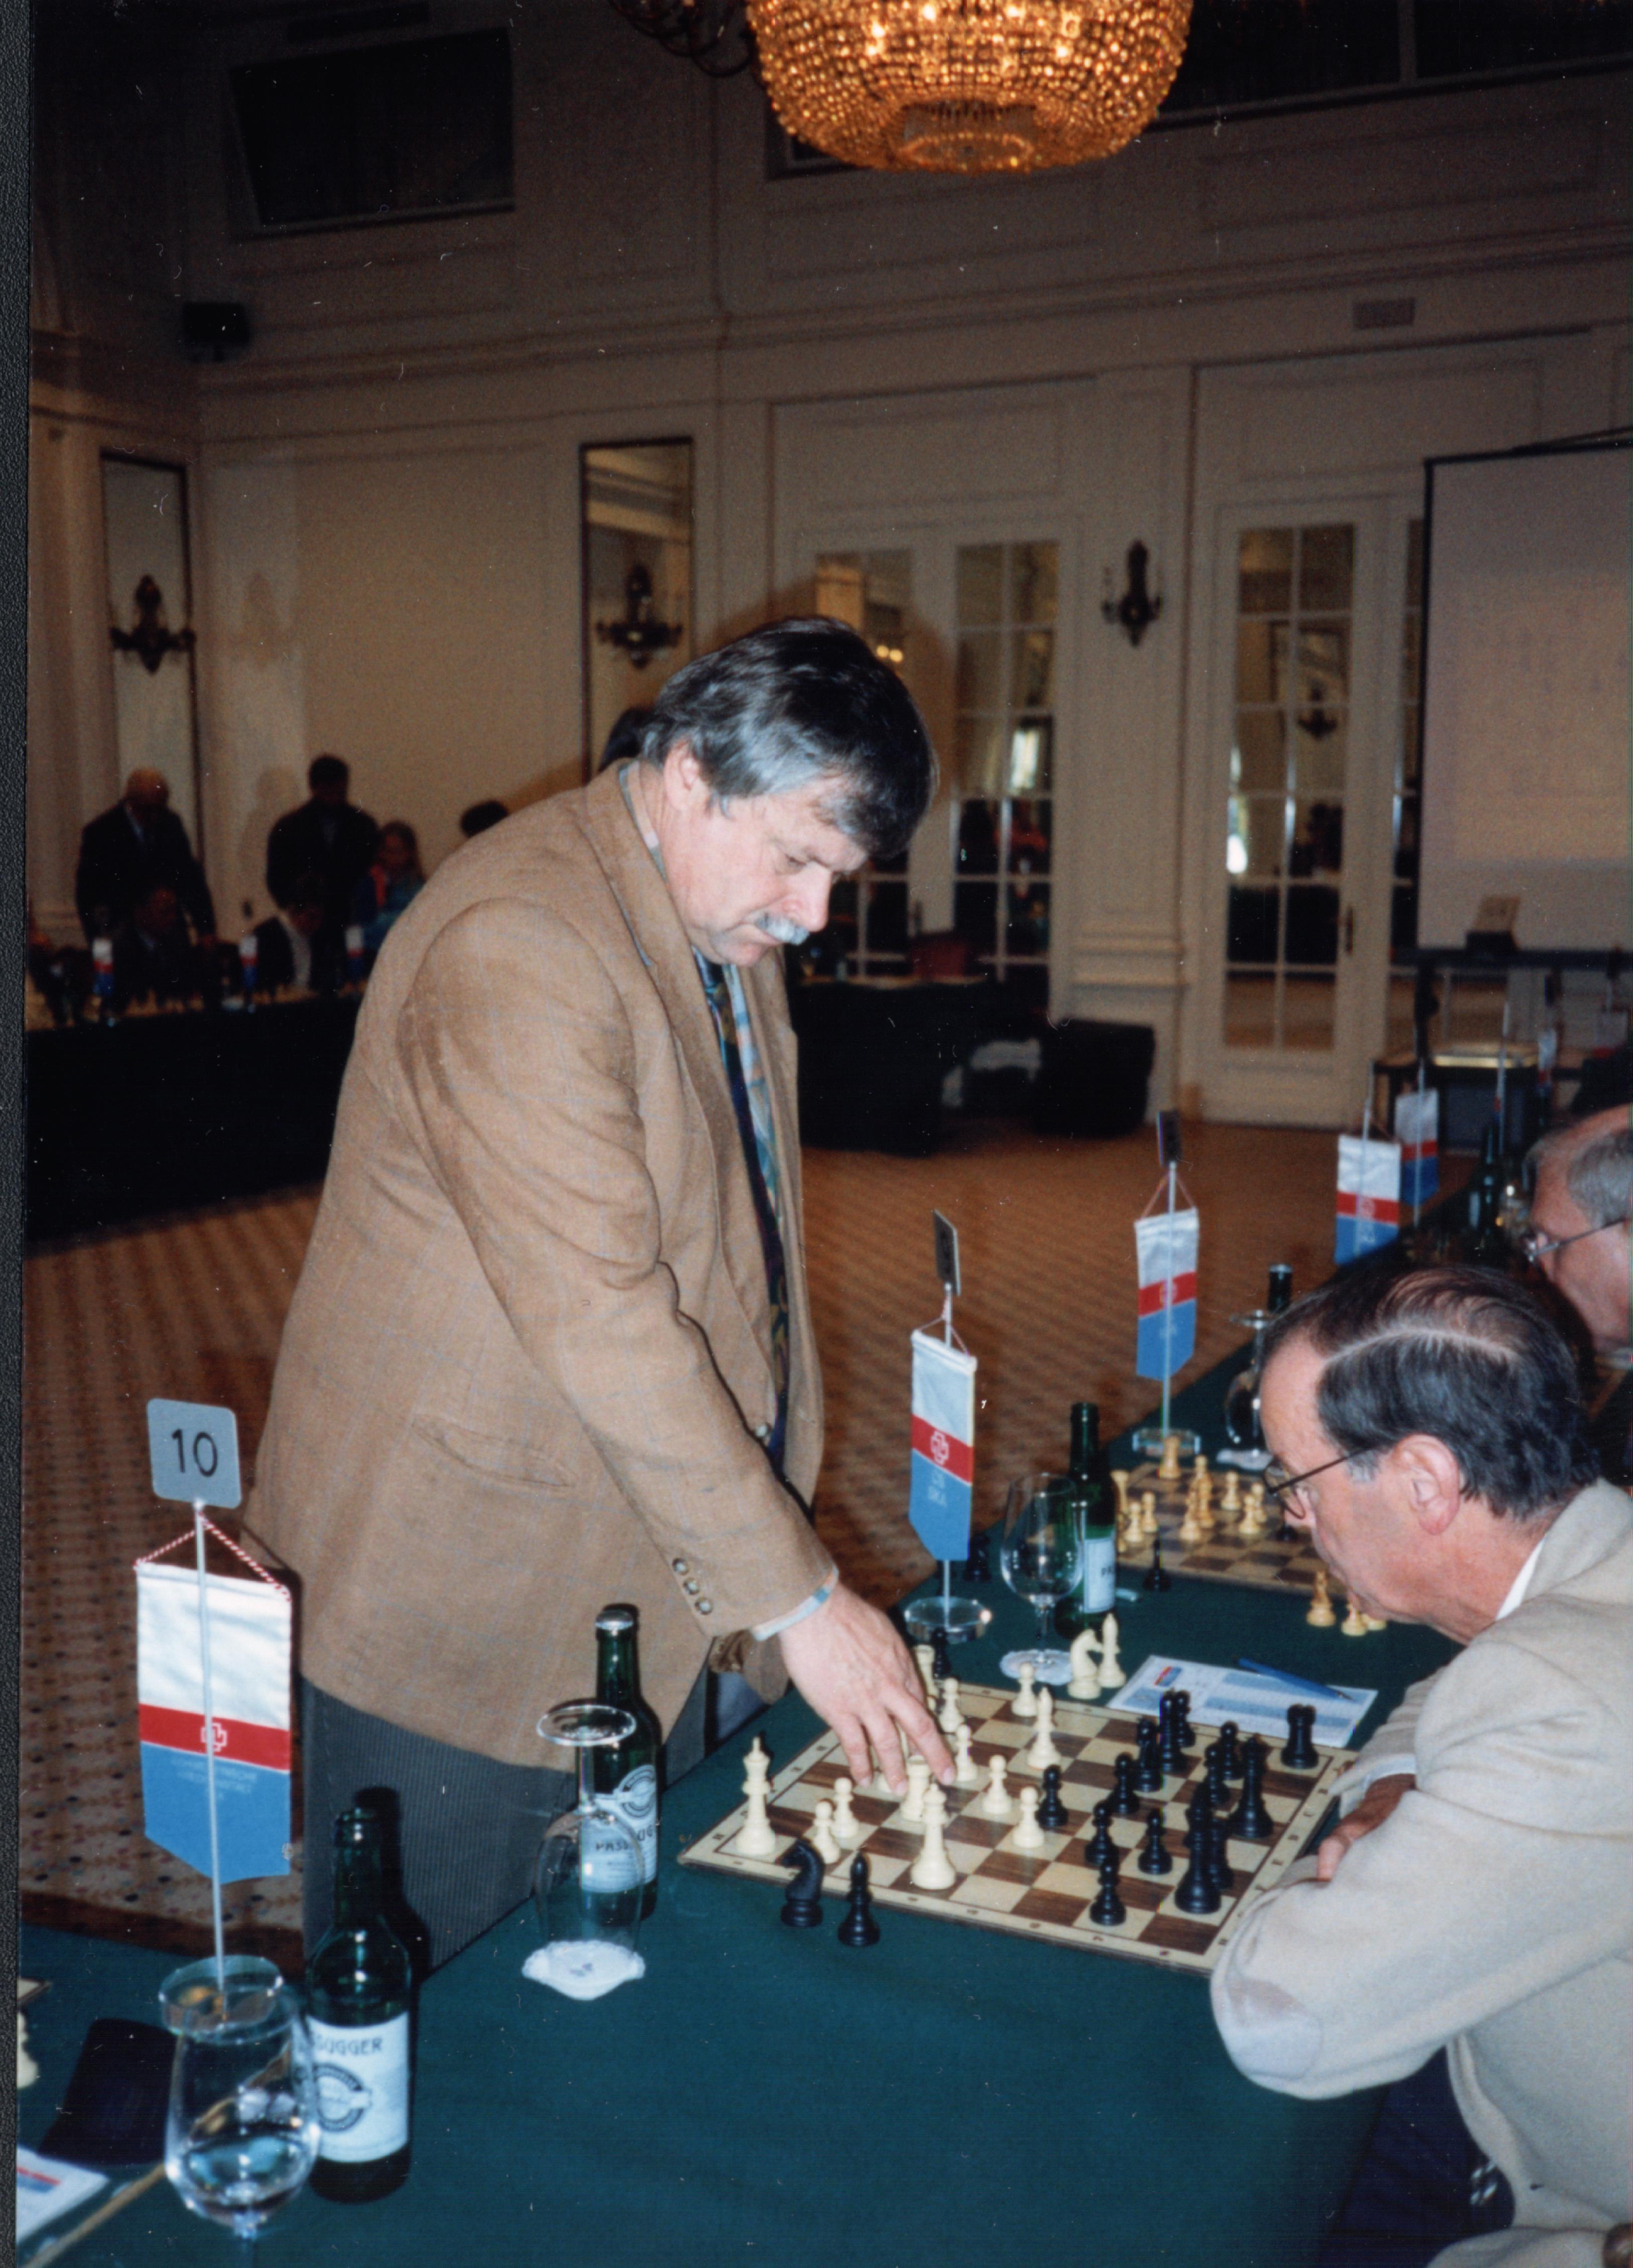 Grandmaster Vlastimil Hort giving a simultaneous exhibition, 1997